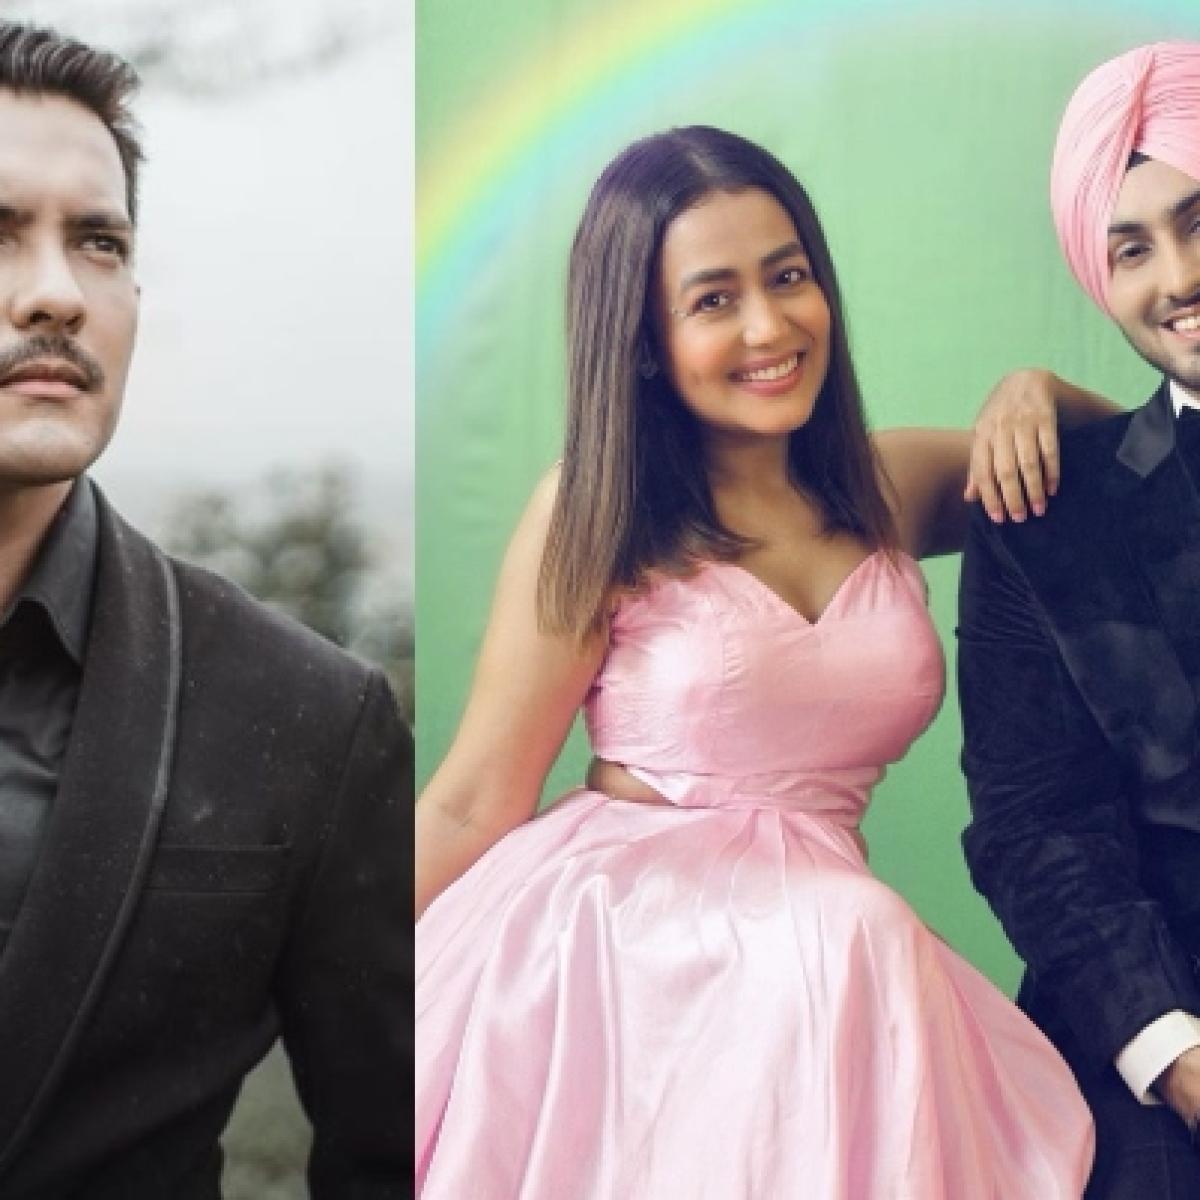 'Haven't received the so-called wedding invitation': Aditya Narayan on Neha Kakkar's  'marriage' with Rohanpreet Singh